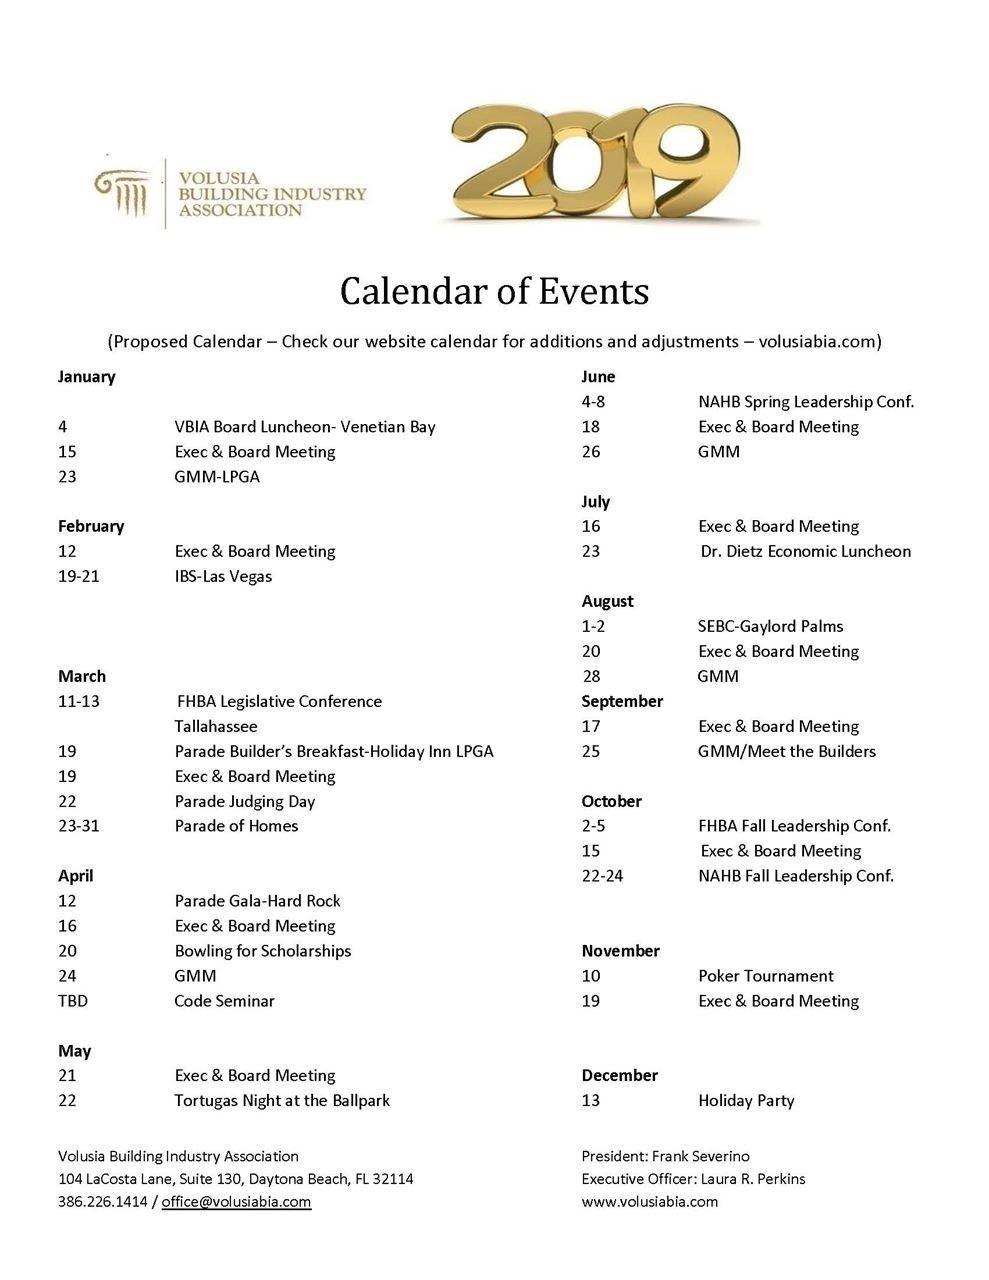 Dashing School Calendar Volusia County 2019 • Printable Blank_School Calendar Volusia County